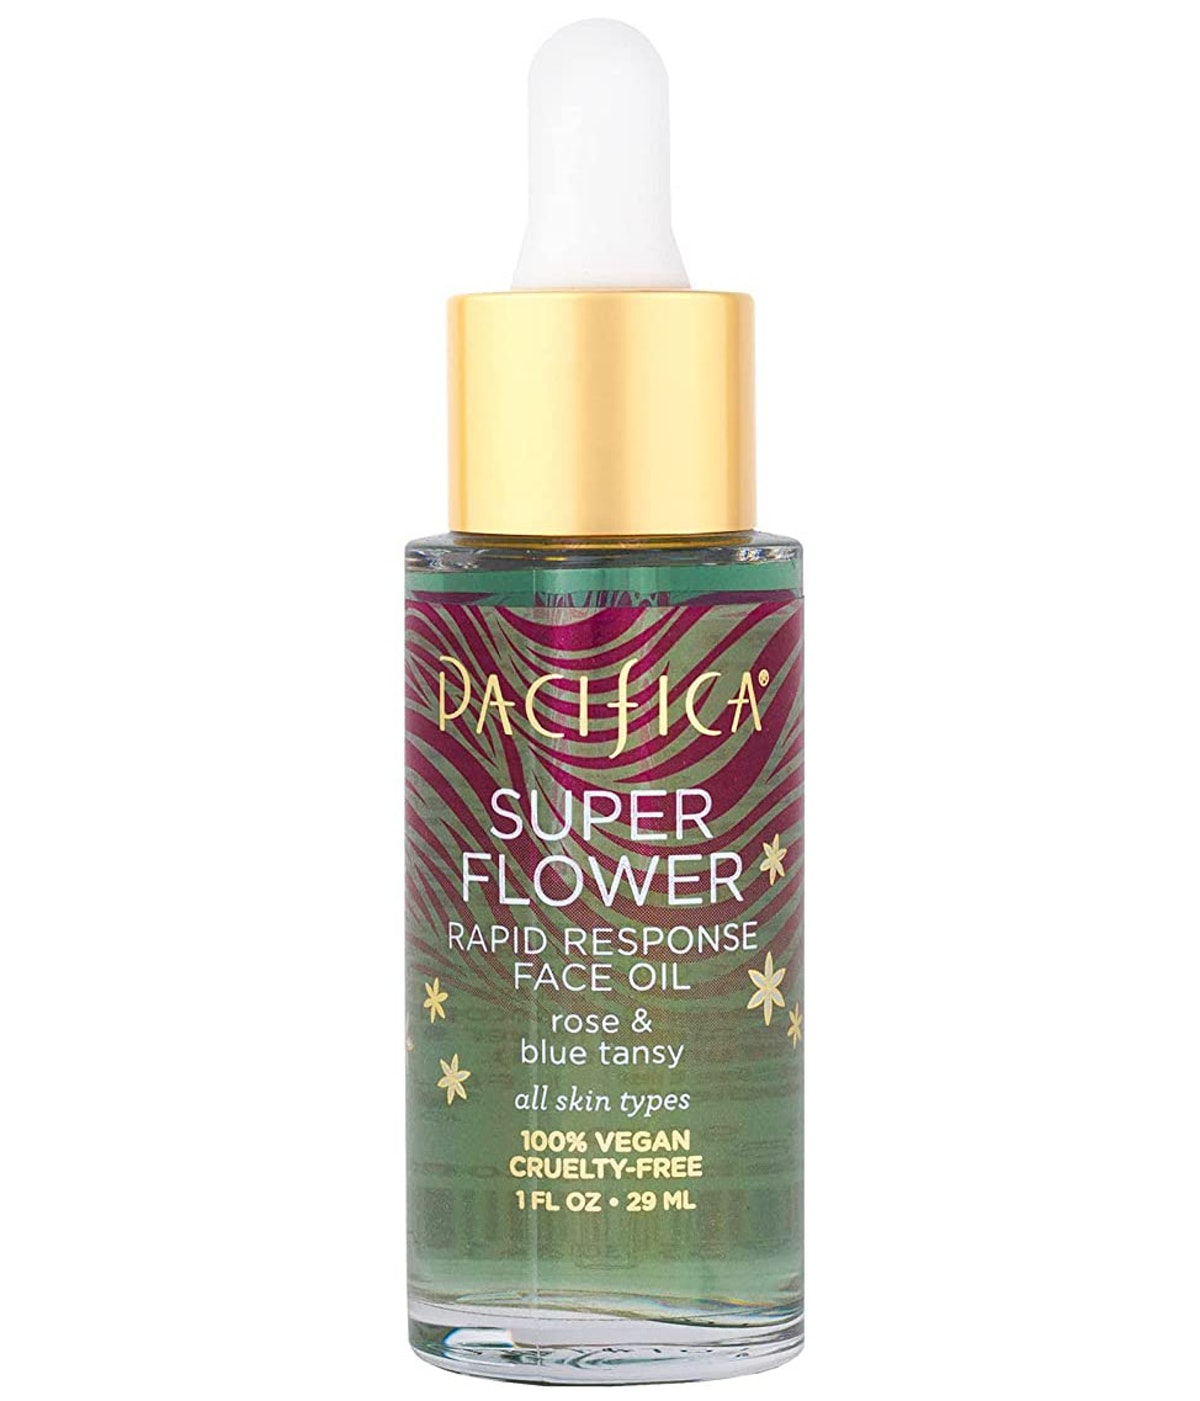 Pacifica Beauty Super Flower Rapid Response Face Oil